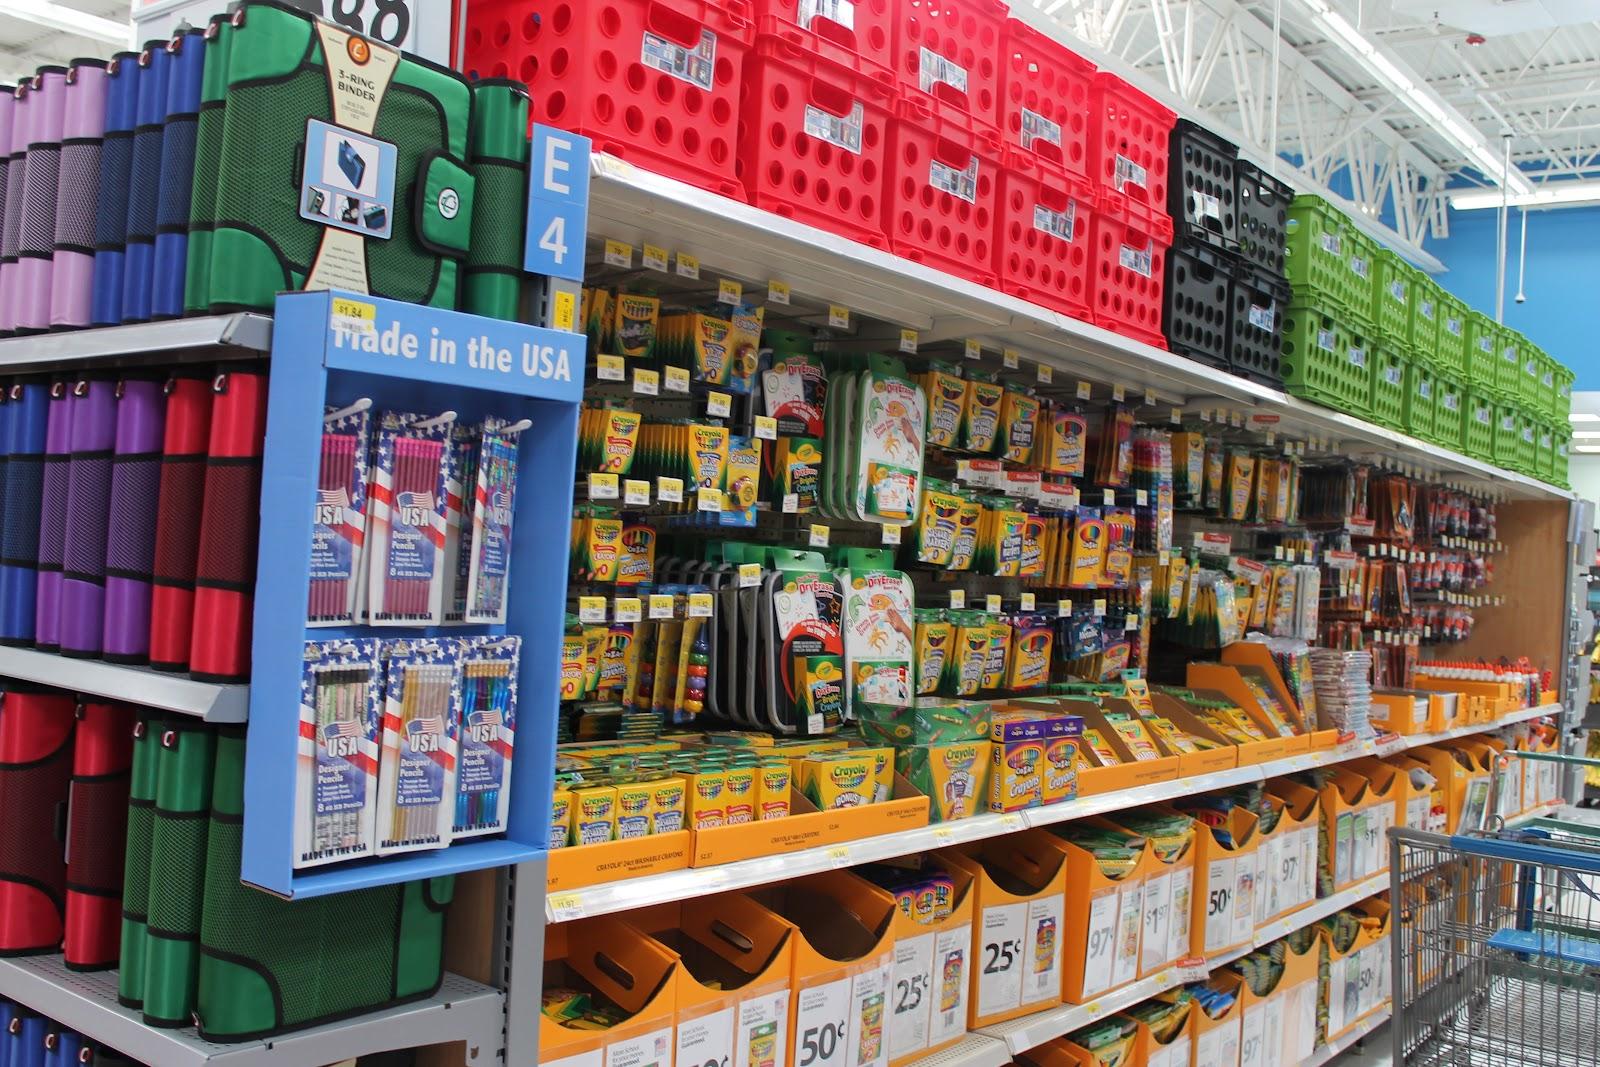 When Does Walmart Layaway Start 2015 | myideasbedroom.com - photo#17